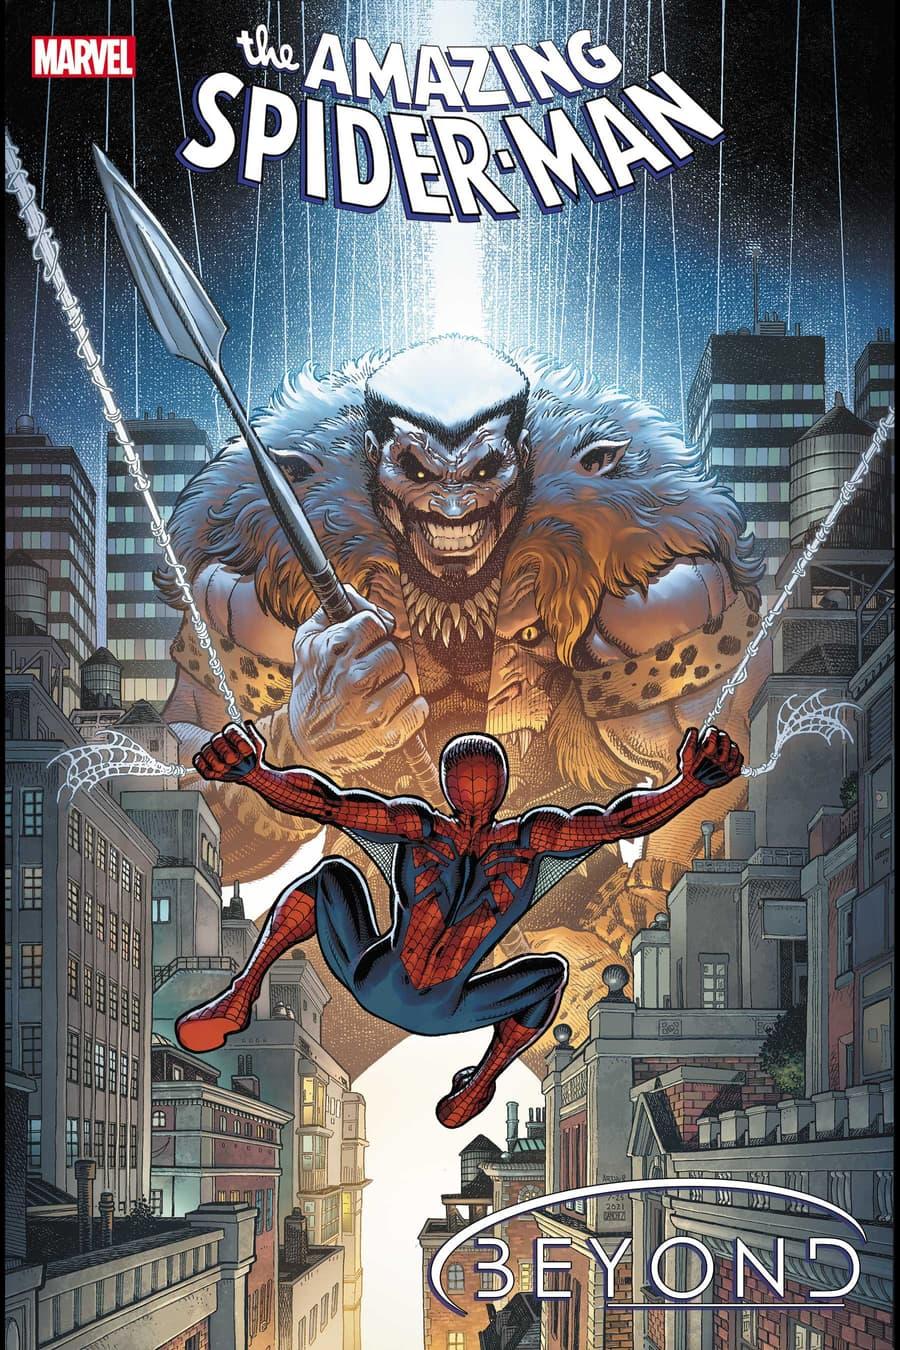 AMAZING SPIDER-MAN #79 cover by Arthur Adams